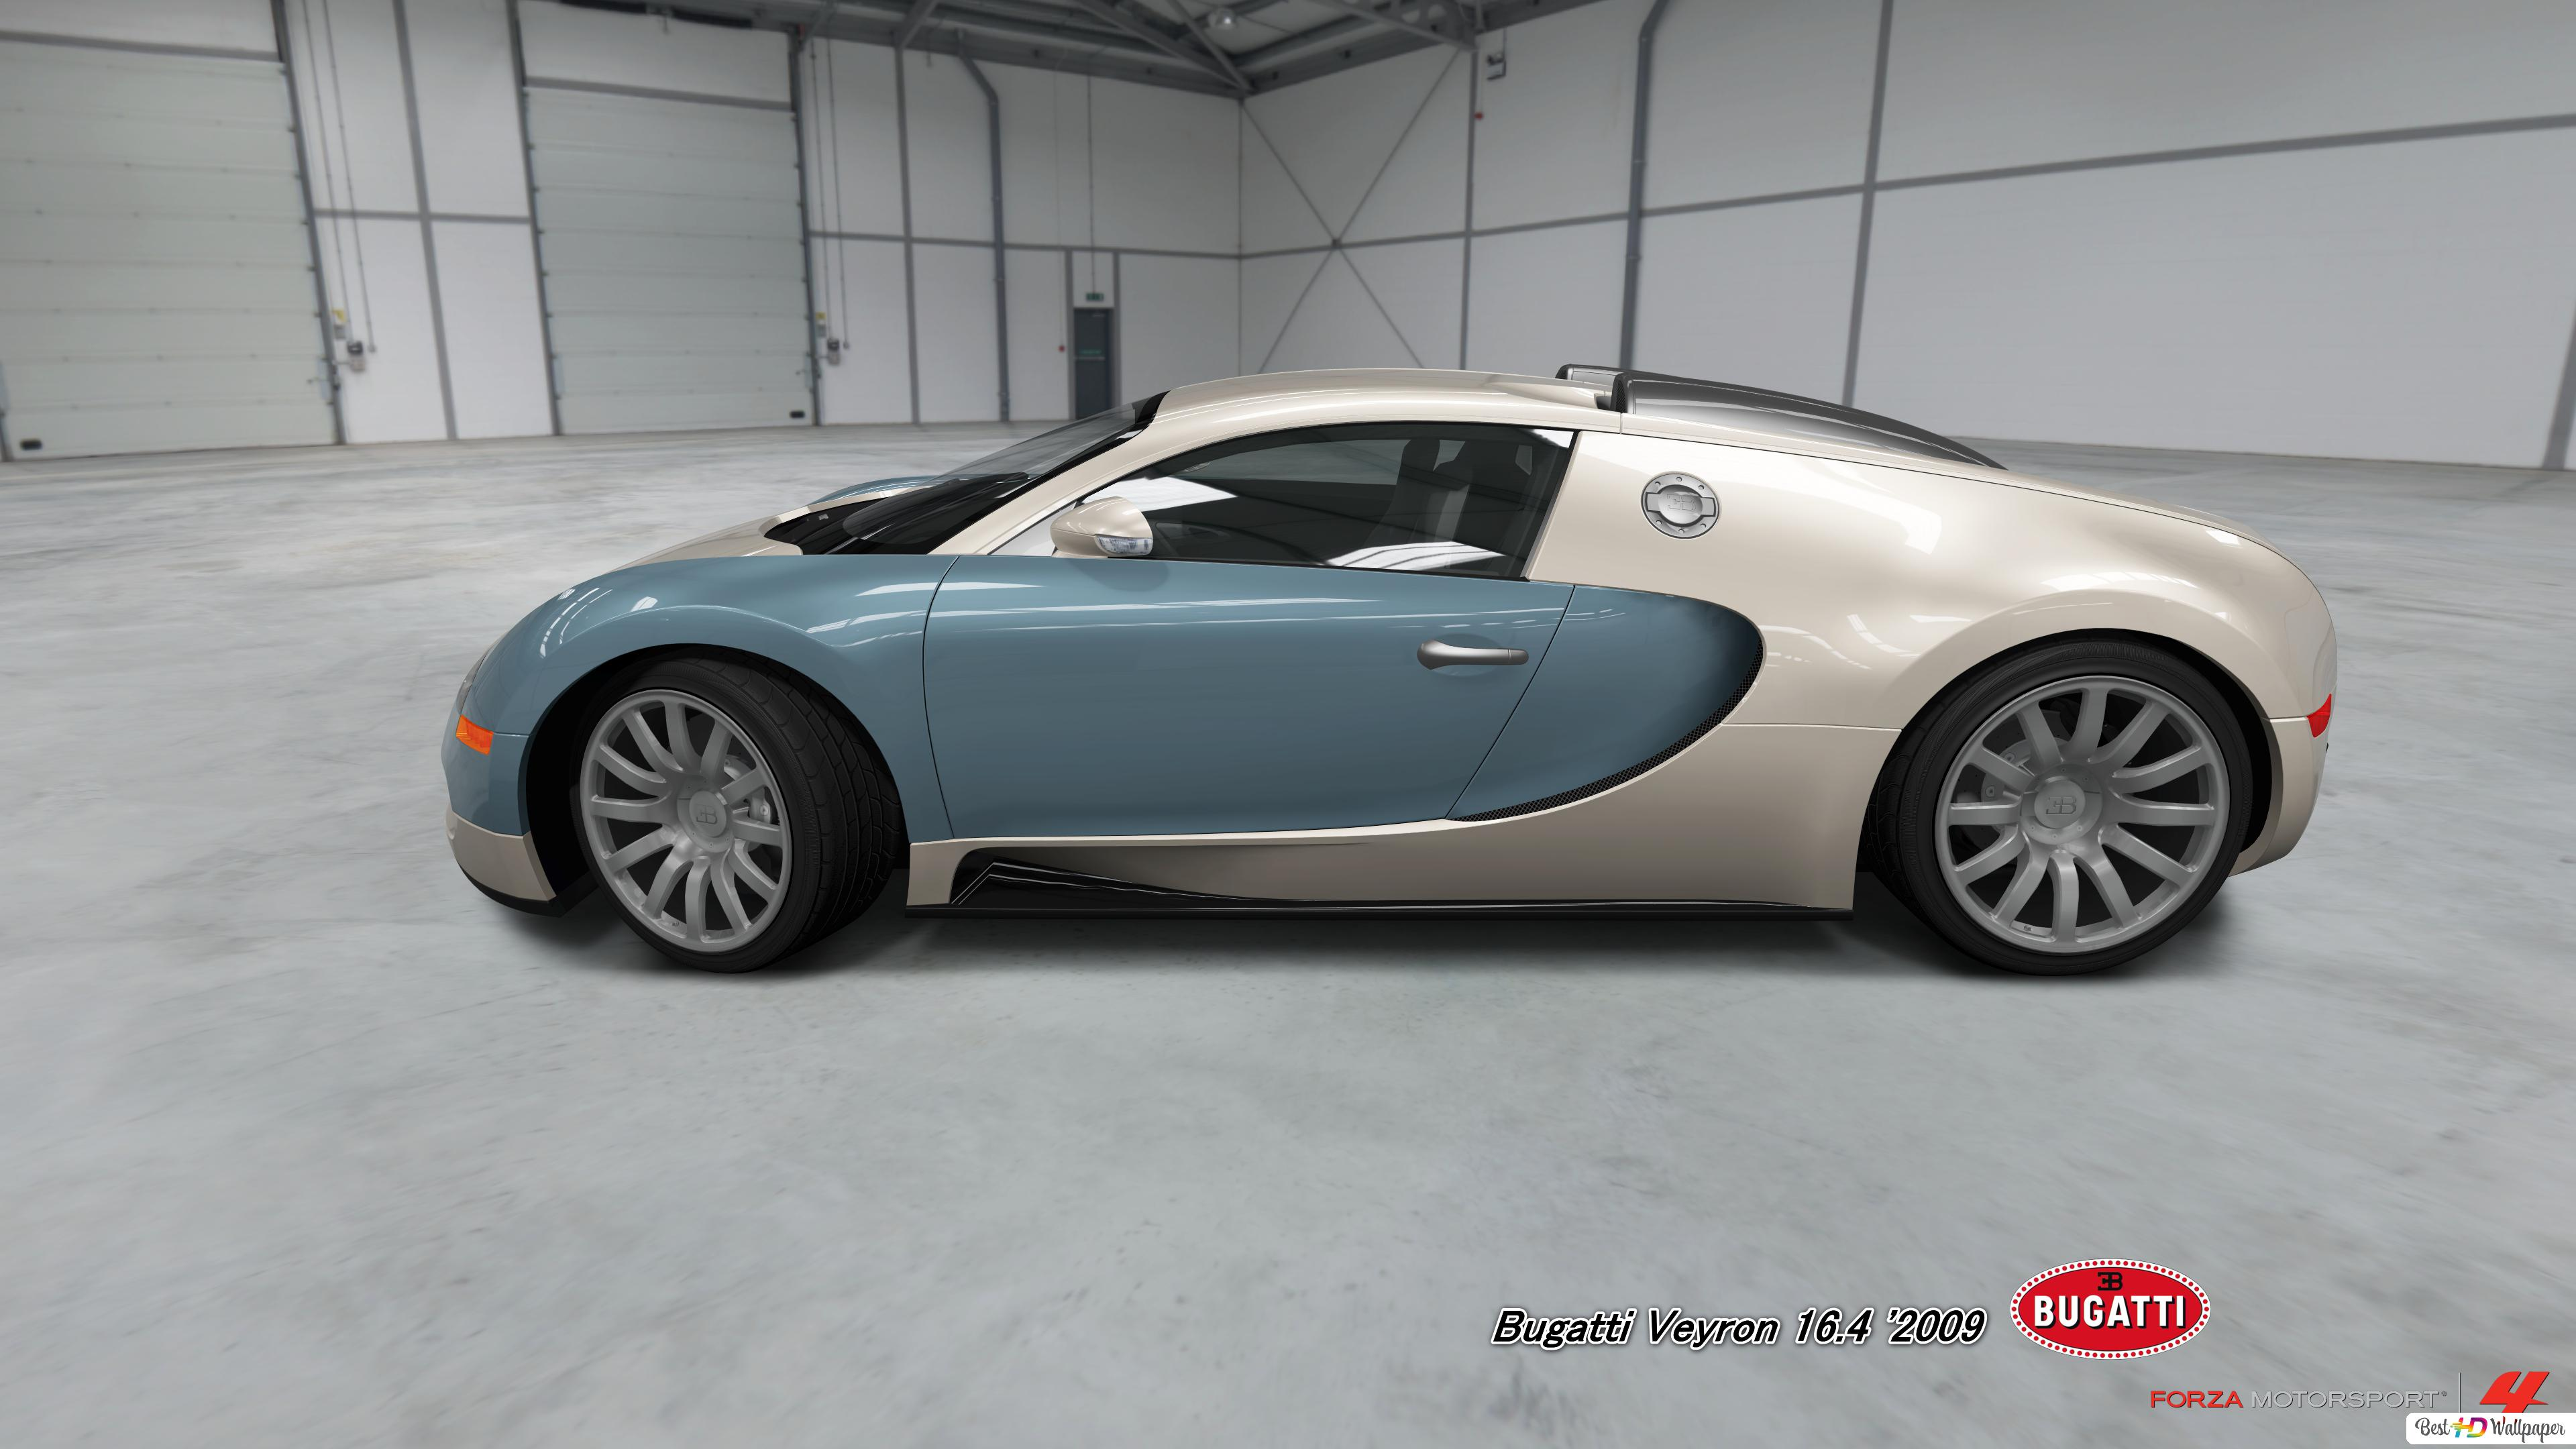 Bugatti Veyron 16 4 Super Sport Hd Wallpaper Download